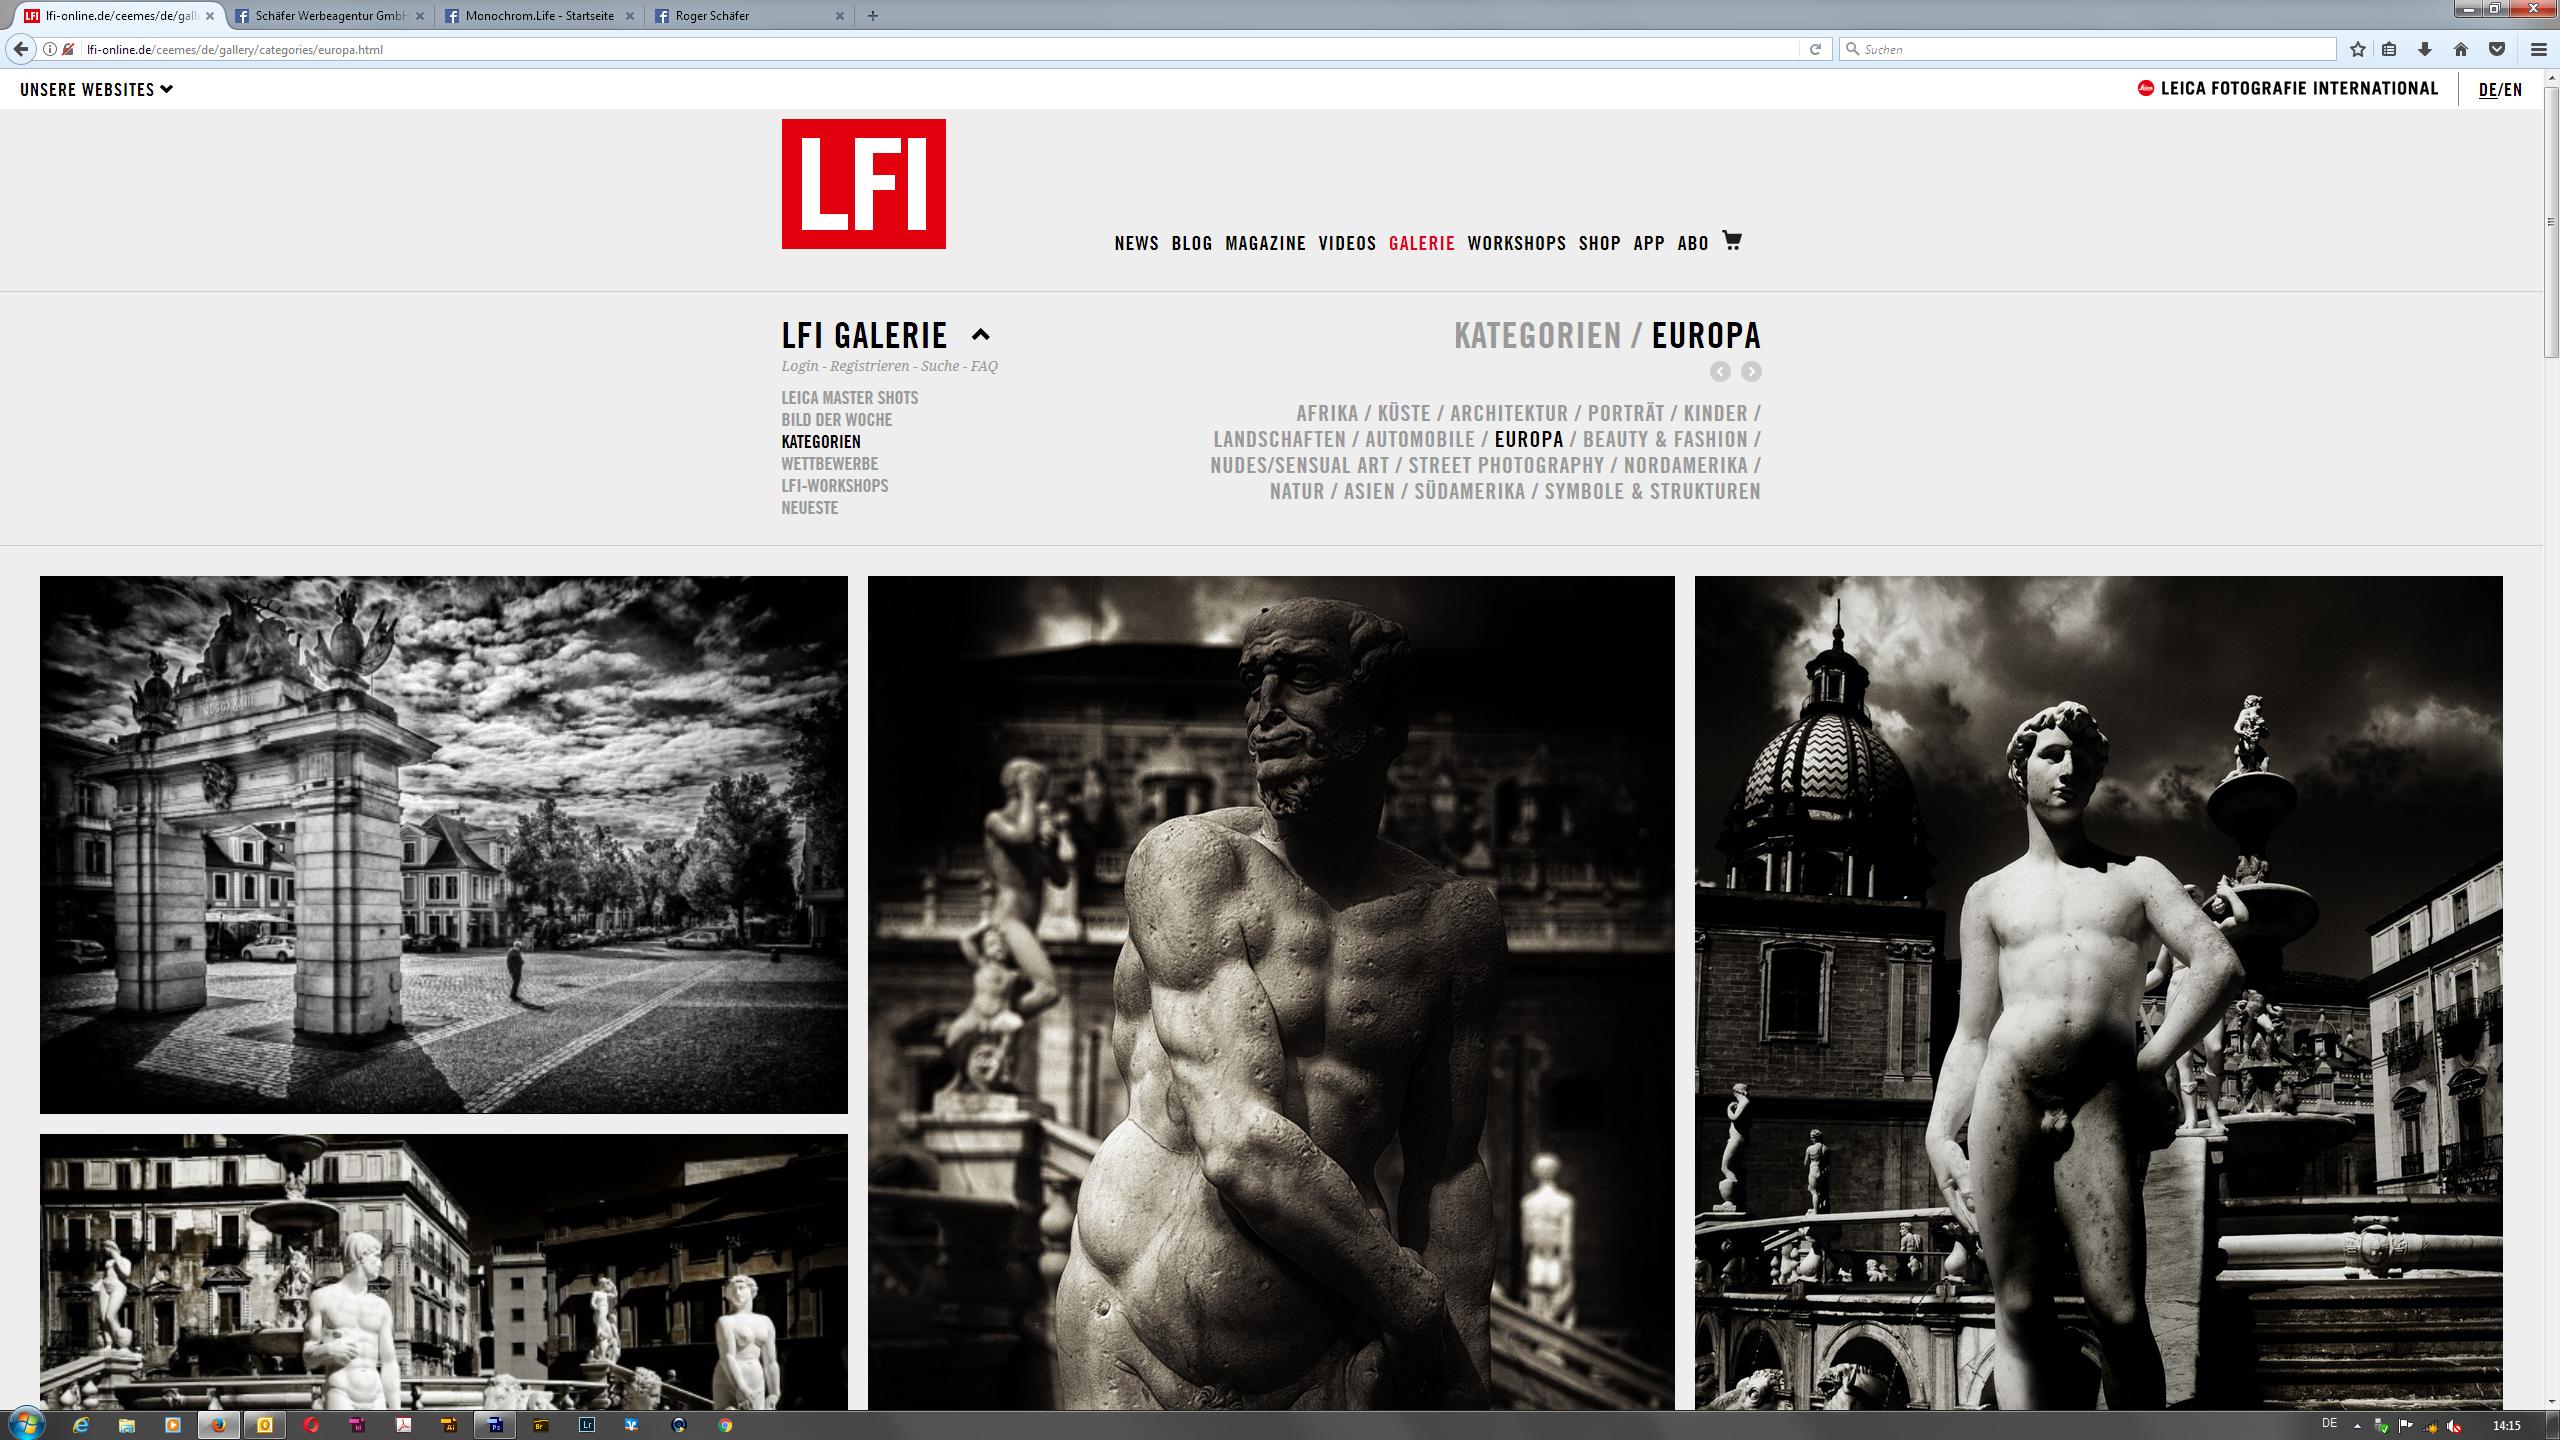 LFI_Europa_09_2017 by .